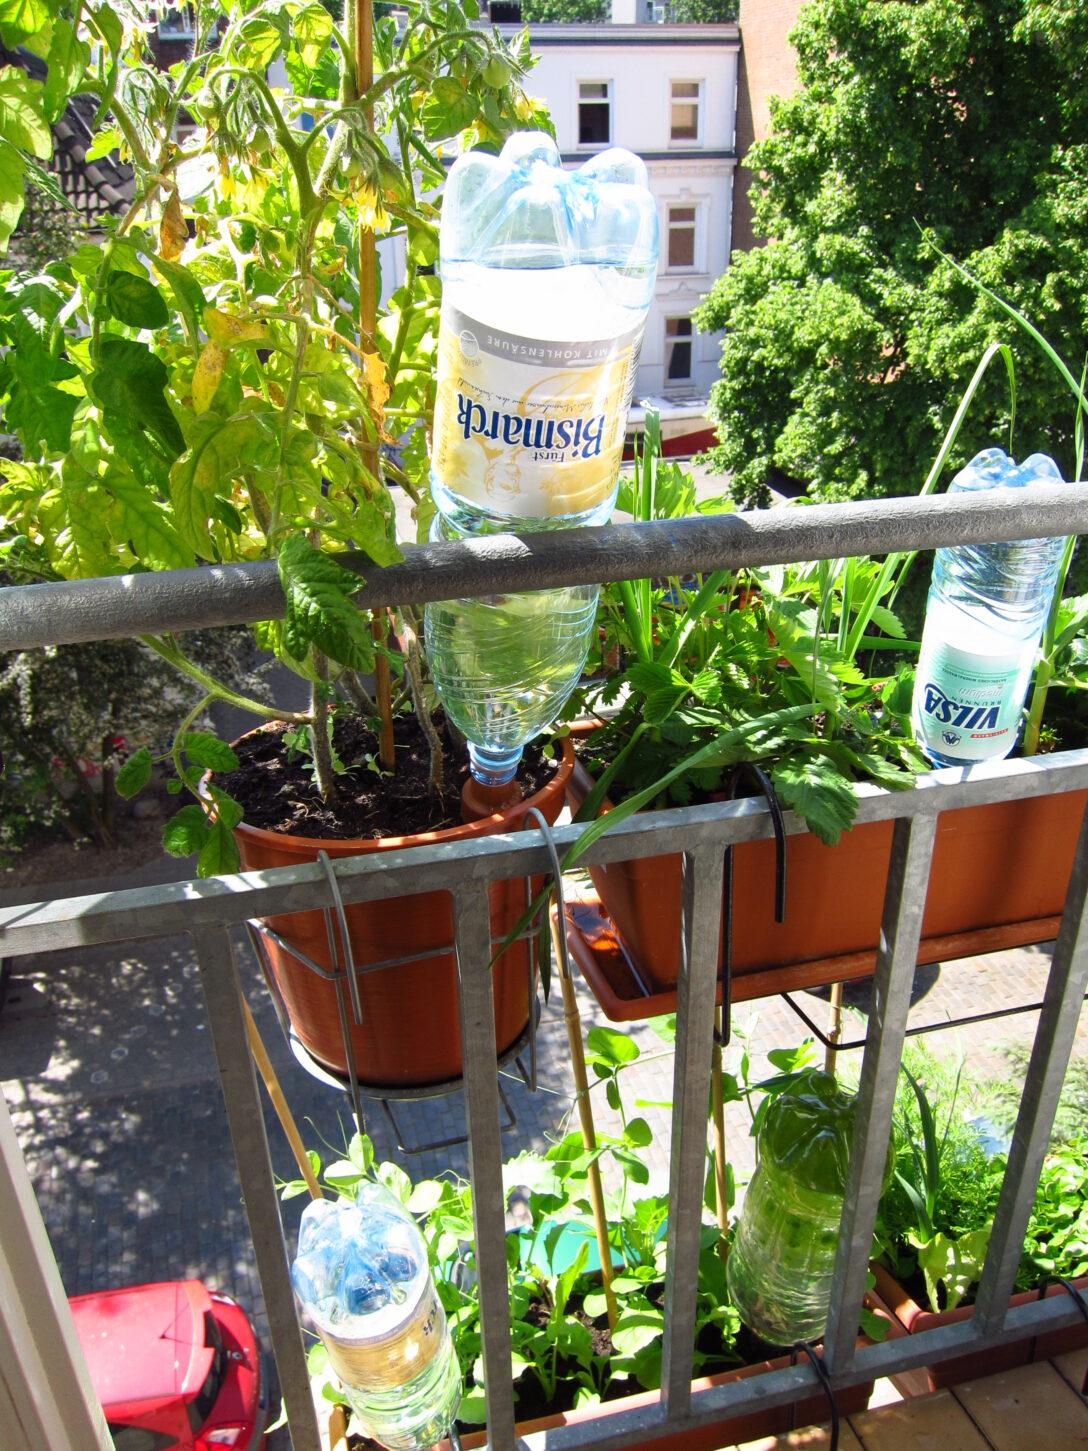 Large Size of Erfahrungsbericht Bewsserung Mit Aufstzen Fr Pet Flaschen Bewässerung Garten Bewässerungssysteme Test Automatisch Bewässerungssystem Wohnzimmer Bewässerung Balkon